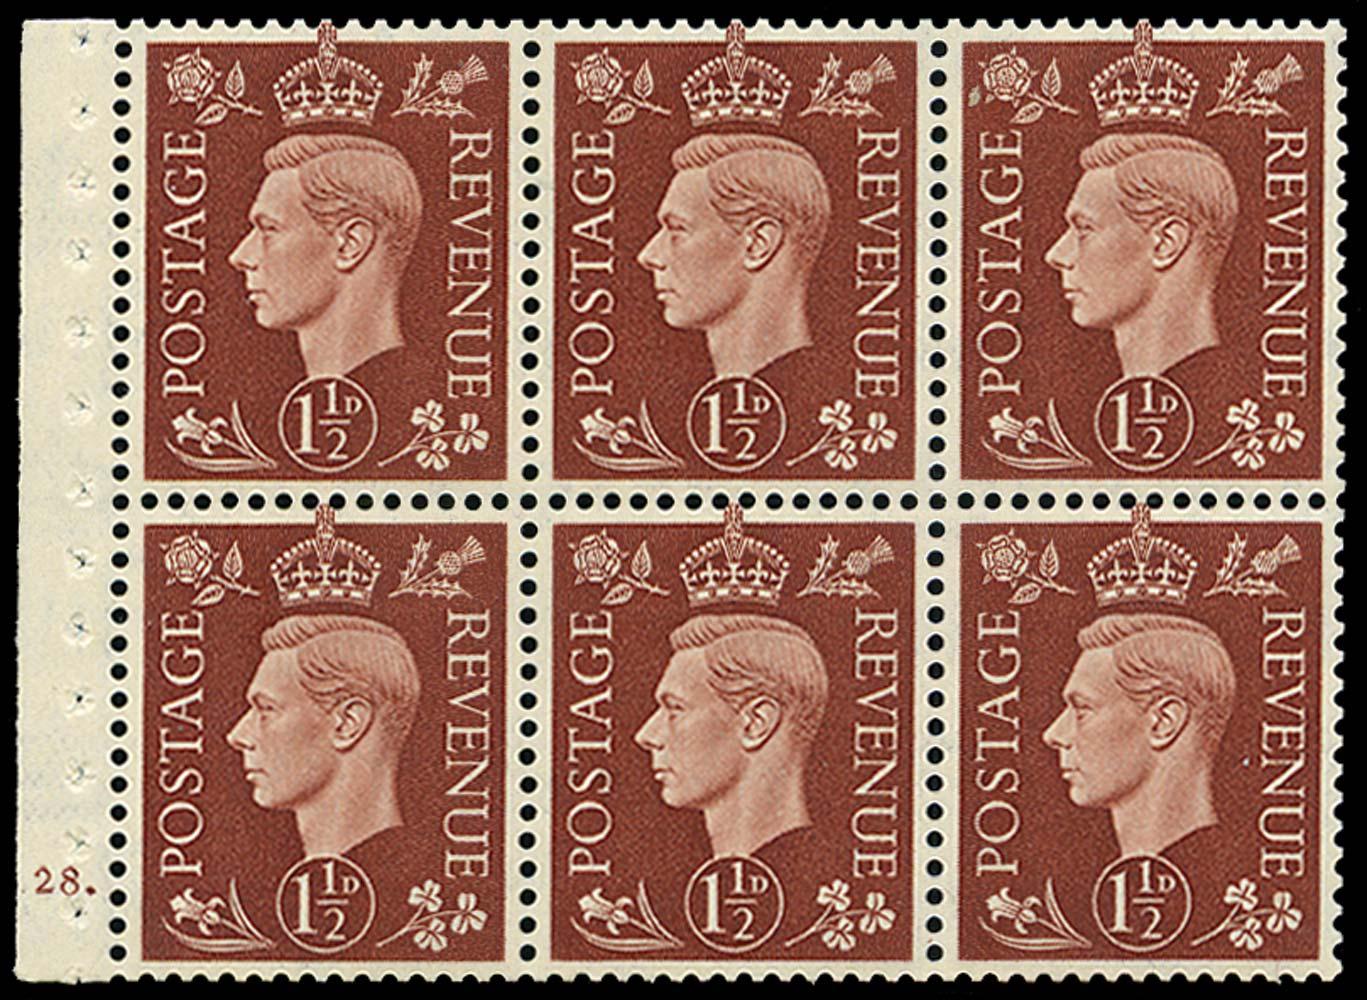 GB 1937  SG464l Booklet pane of six, U/M